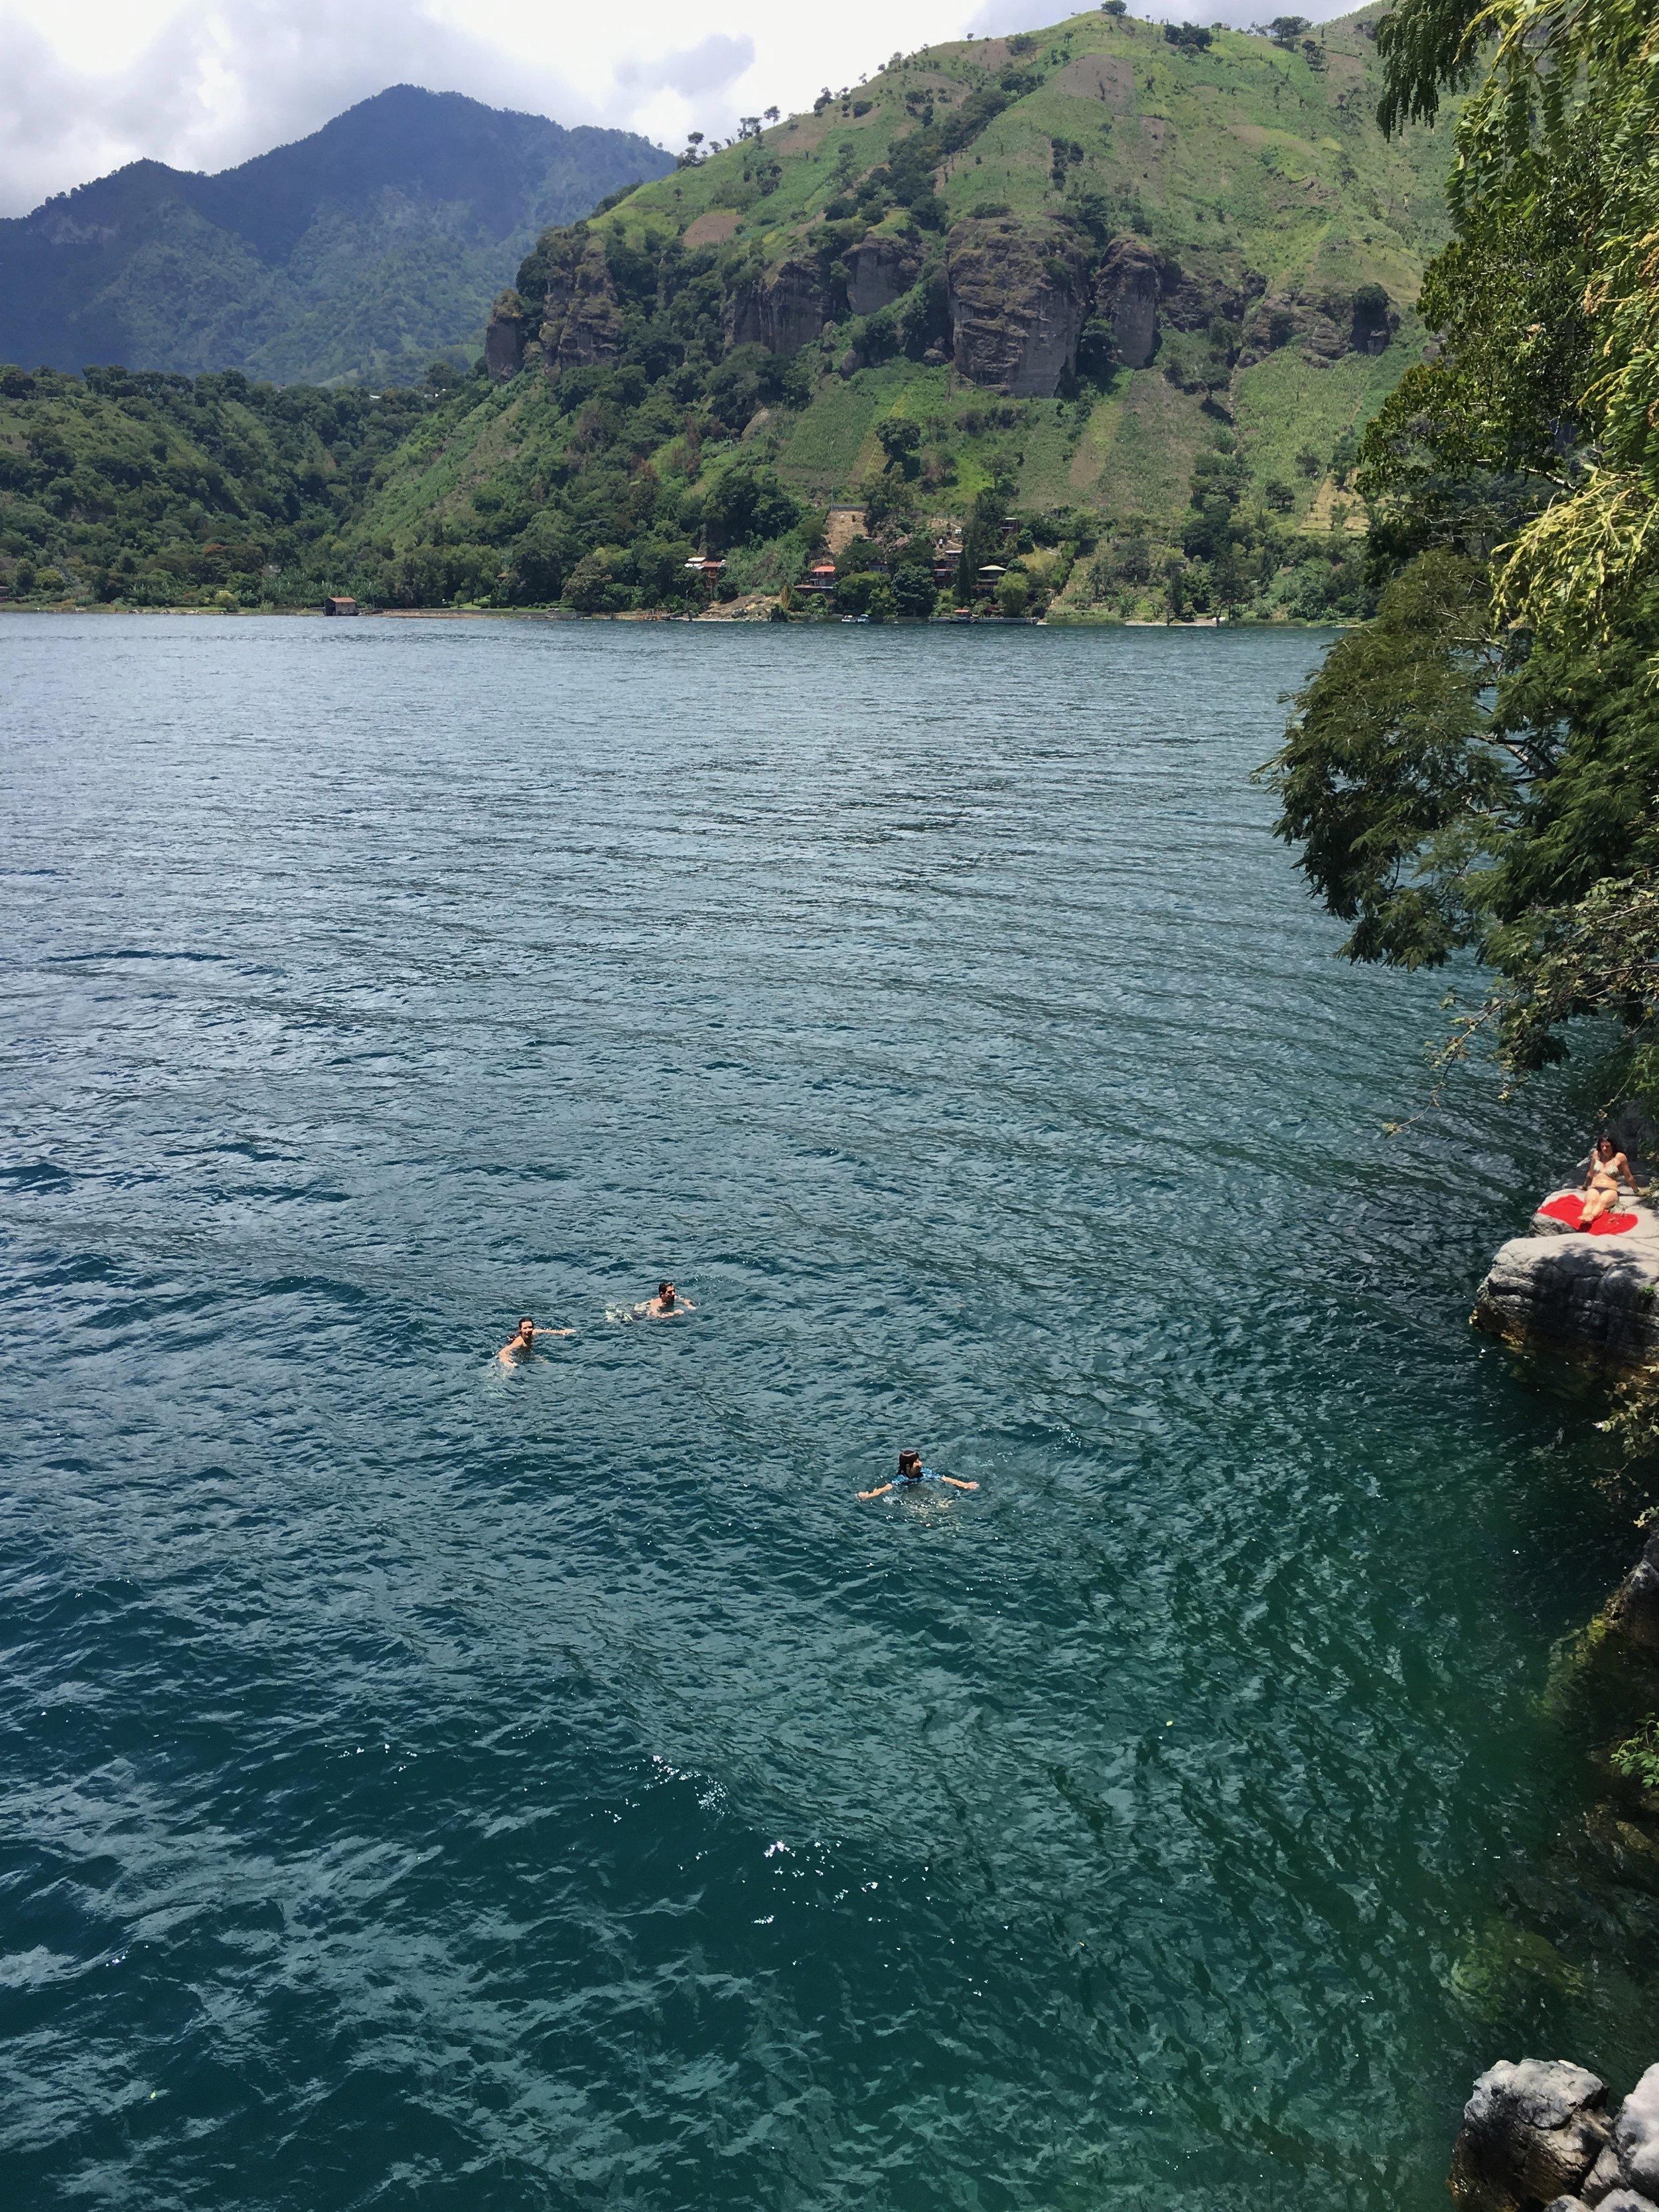 People swimming below